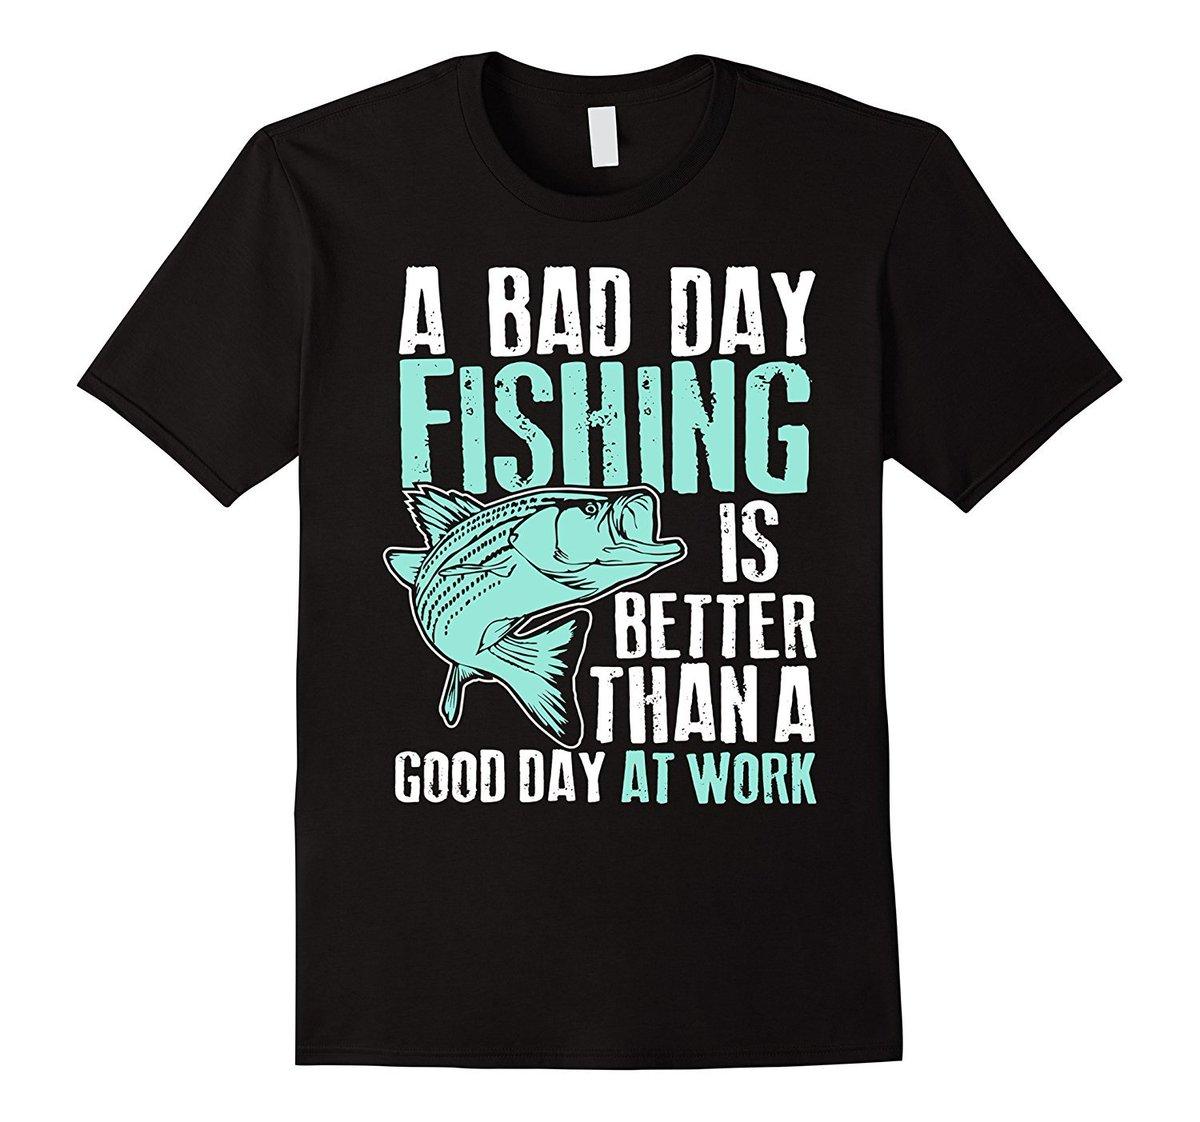 https://t.co/jppMJa65pv I'd rather have a bad day fishing! #fishing #flyfishing #carpfishing #<b>Bas